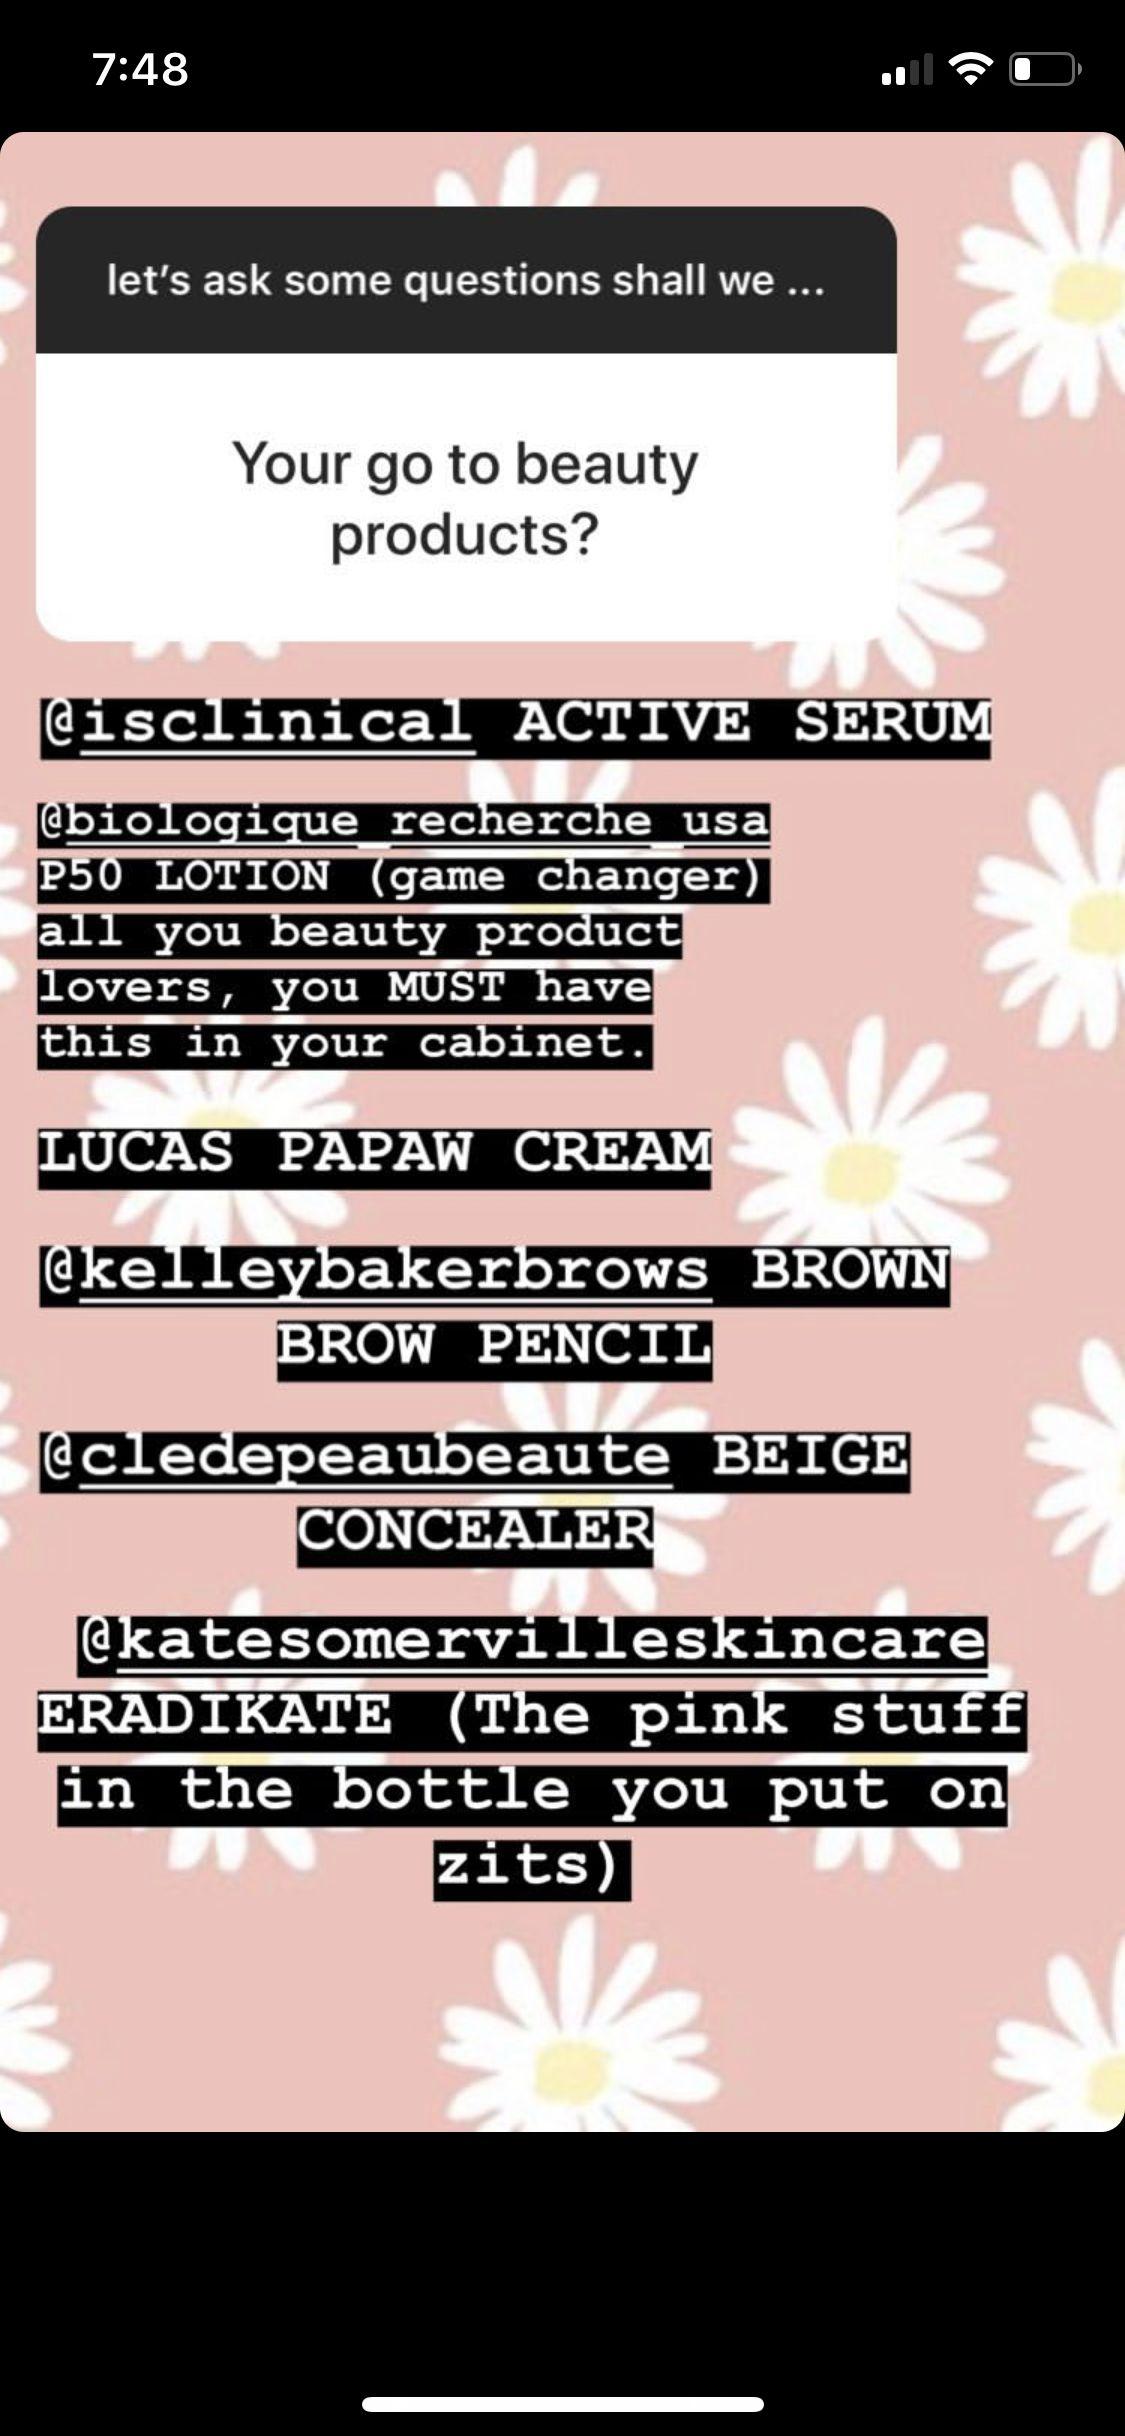 Pin By Madelyn Fry On Beauty Bravado Brown Brow Pencil Brow Pencils Bravado